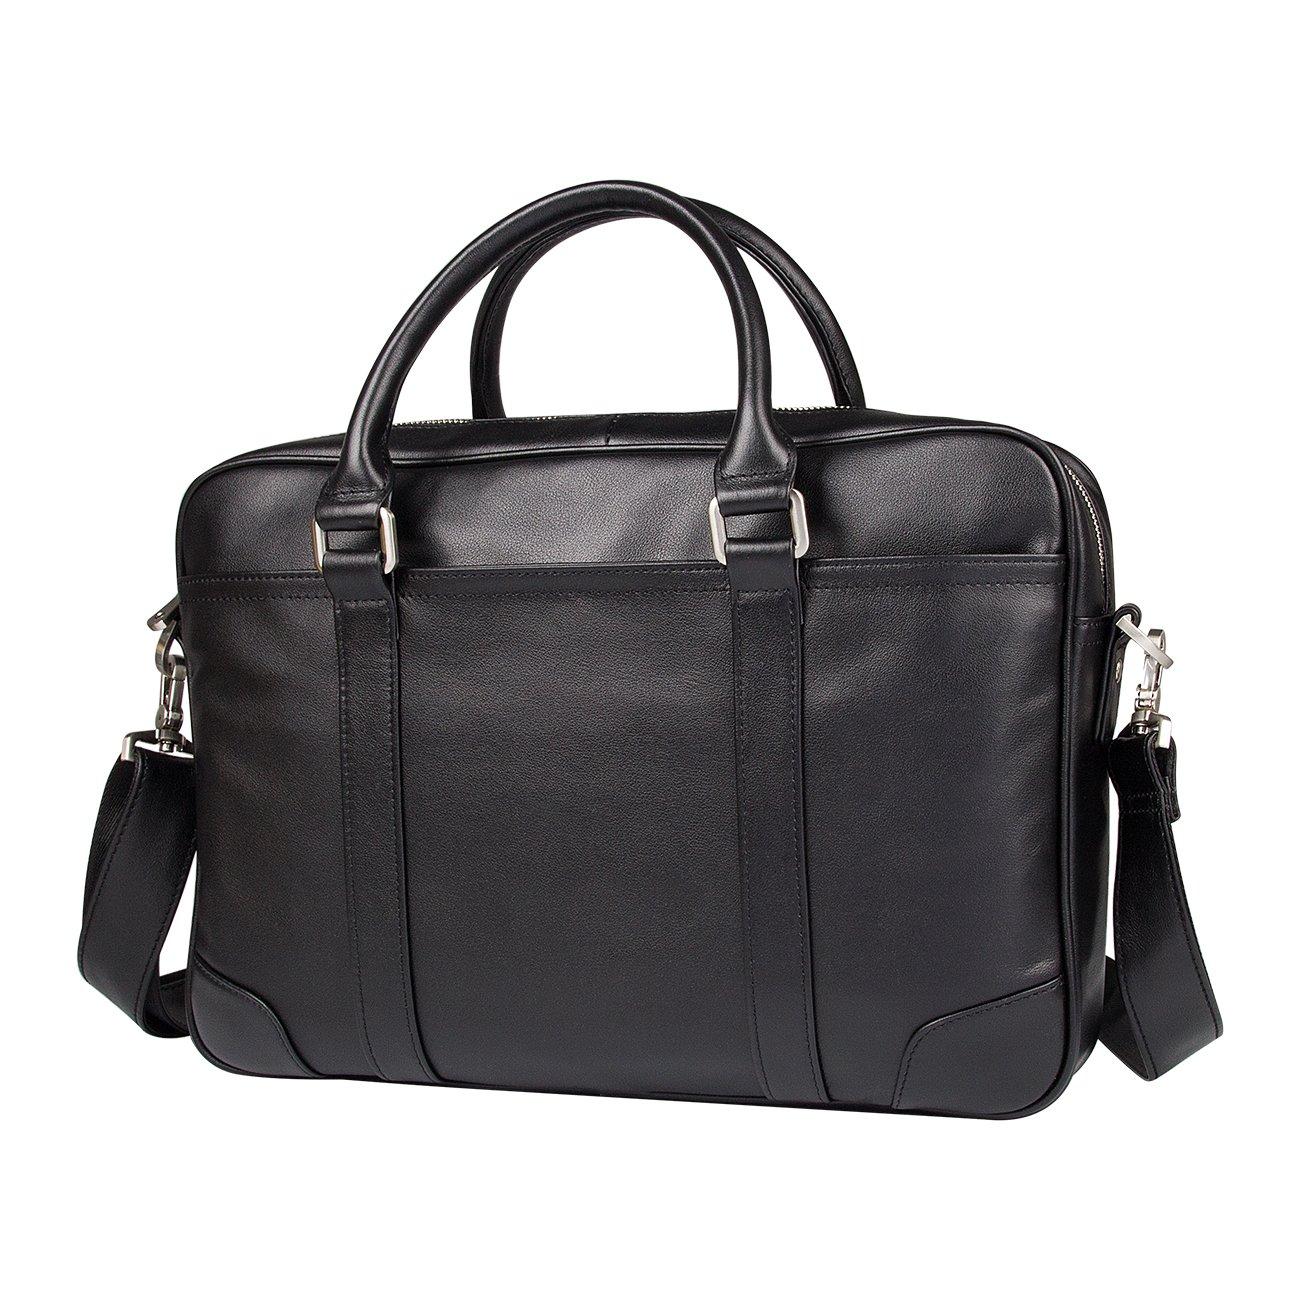 Mens Briefcase Leather Laptop Messenger Bag Tote Bag Organizer For 15 Laptop